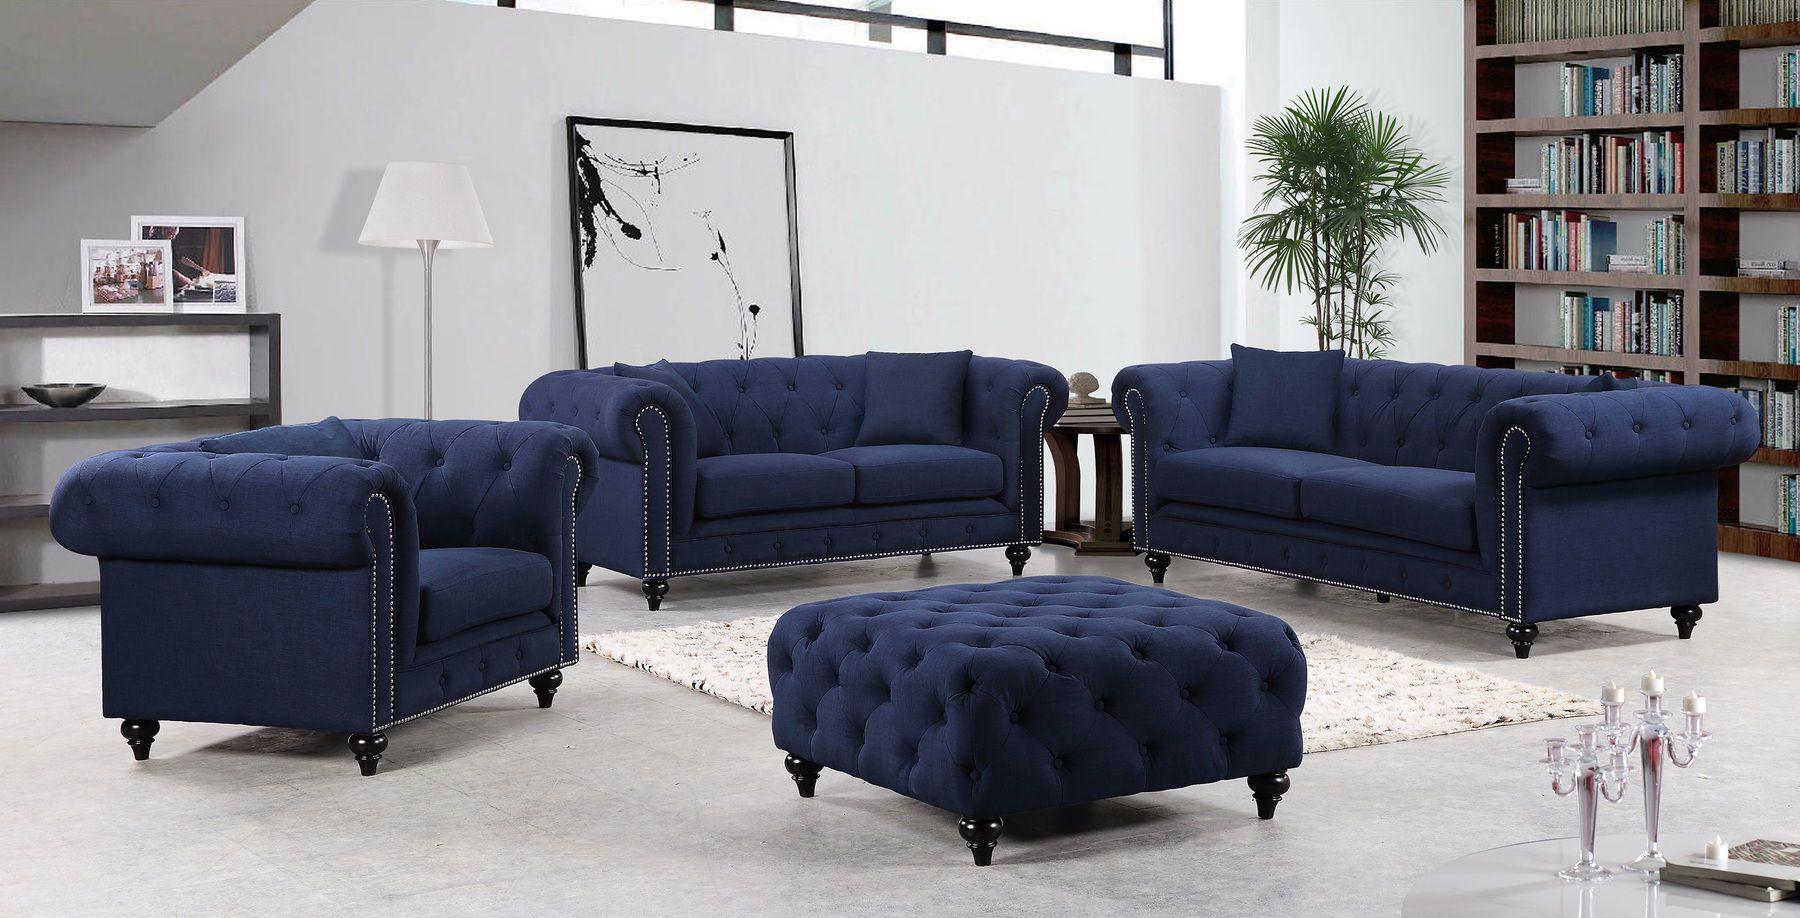 Chesterfield Navy Sofa 662 Meridian Furniture Fabric Sofas Furniture Sofa Set Corner Sofa Design Sofa Furniture